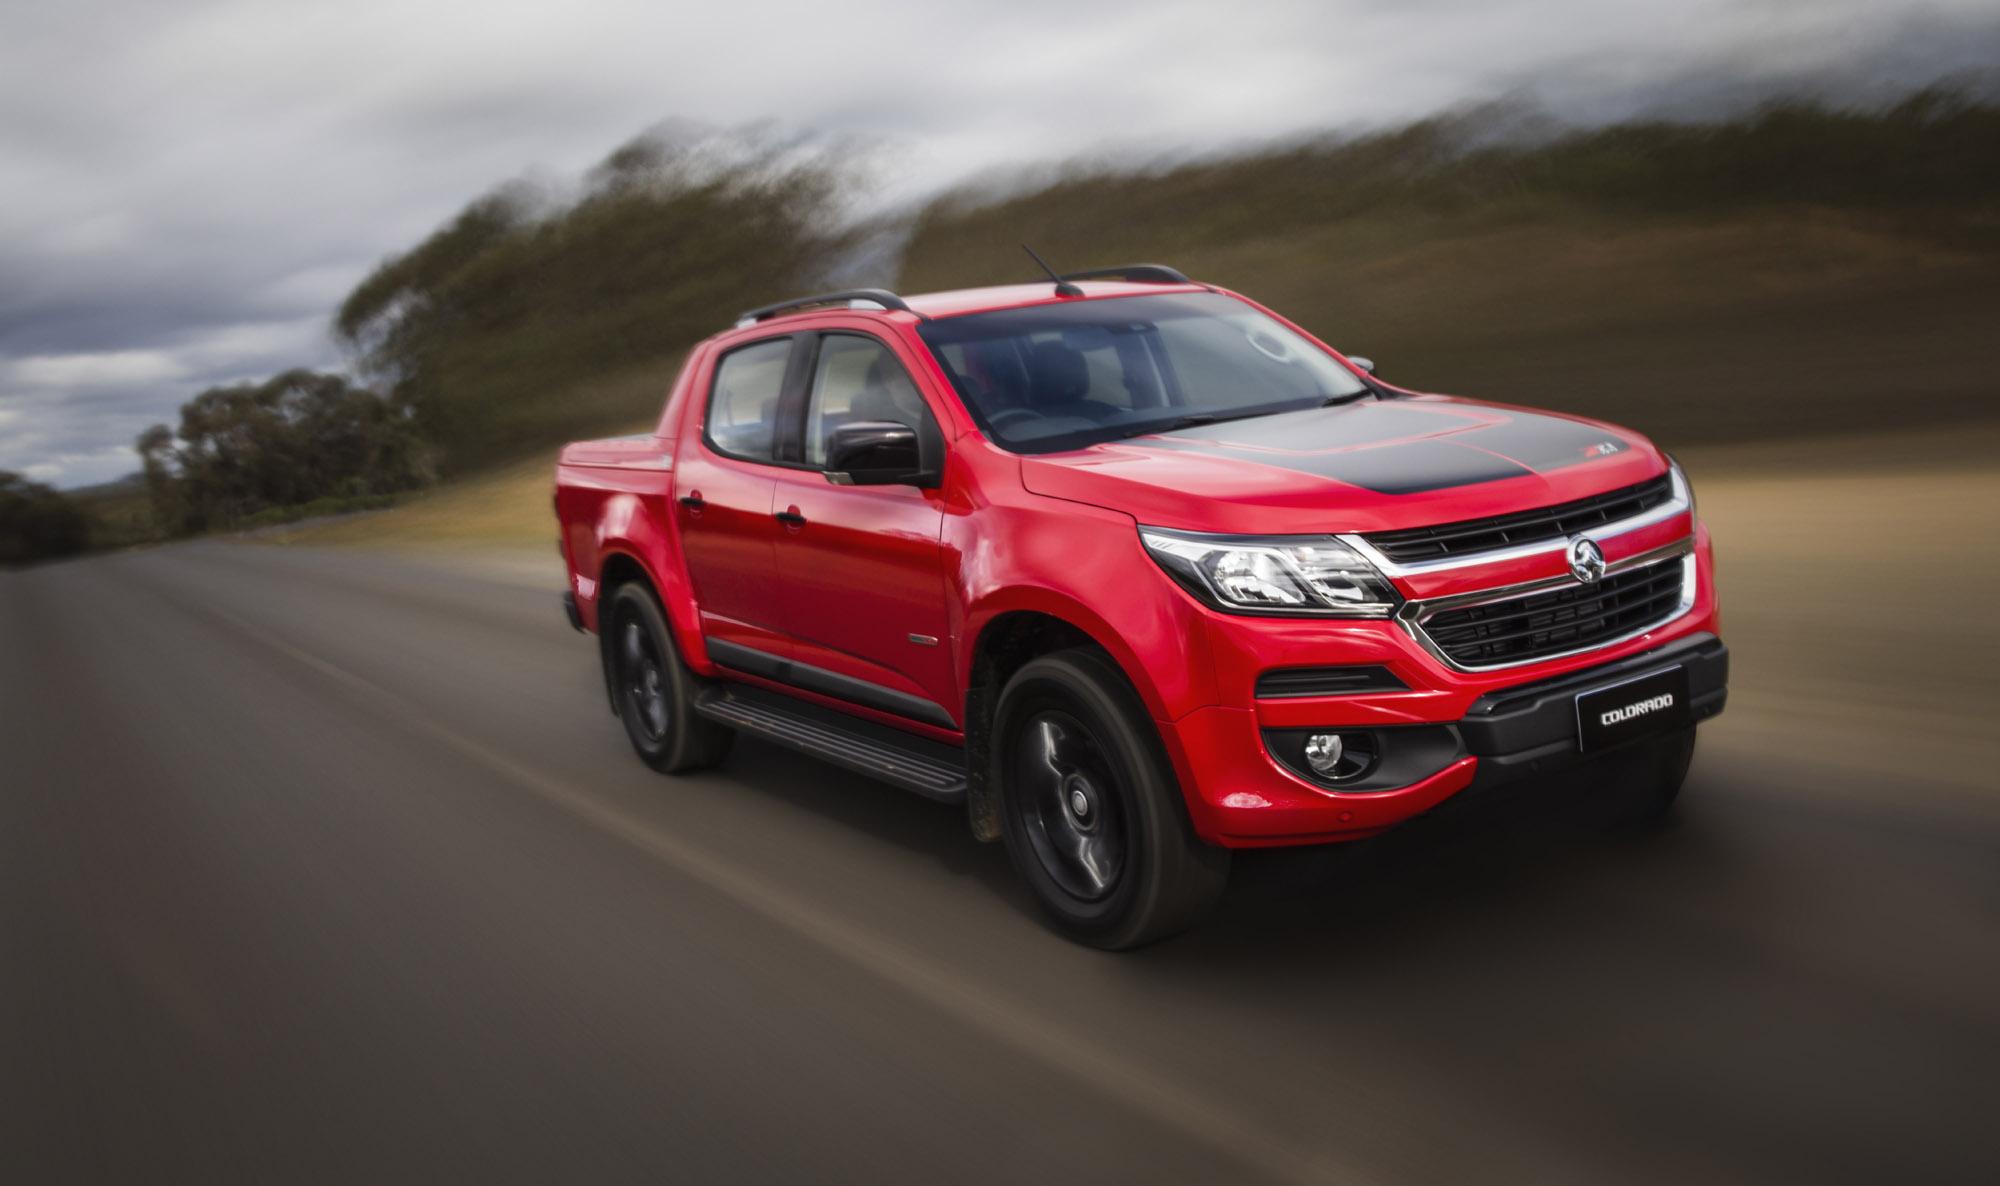 2017 Holden Colorado Review | CarAdvice